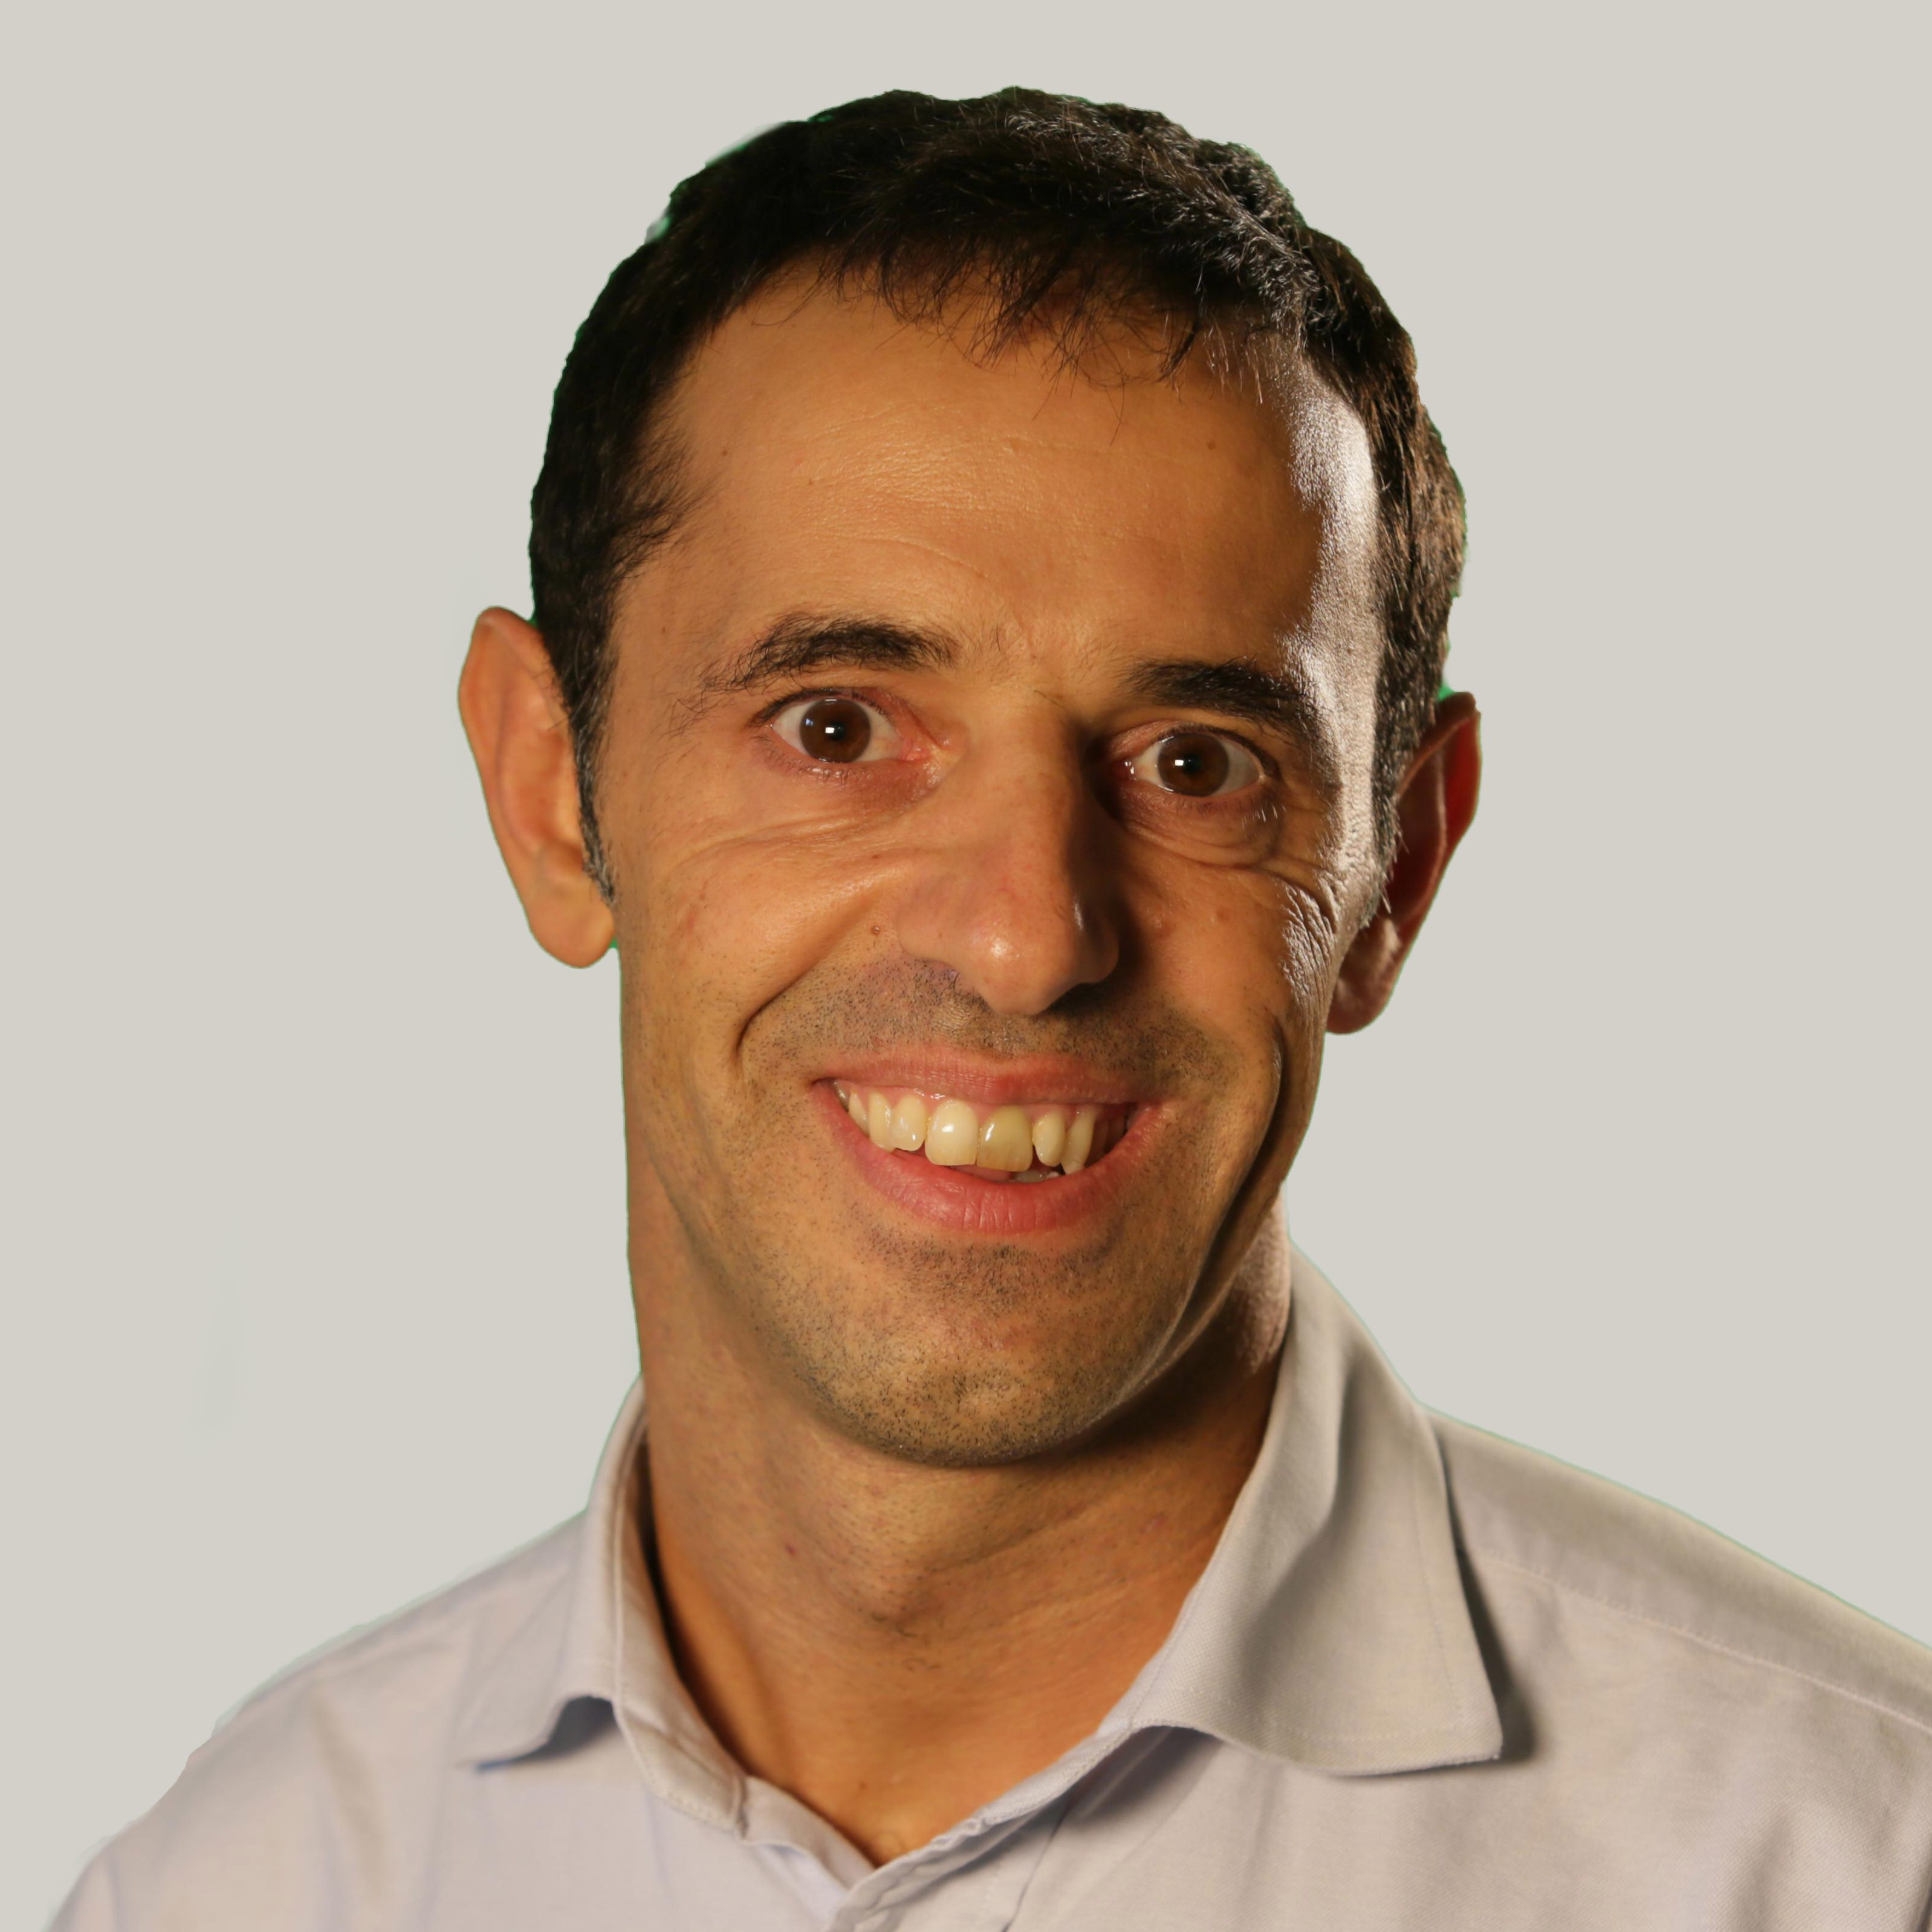 Jordi Mallen